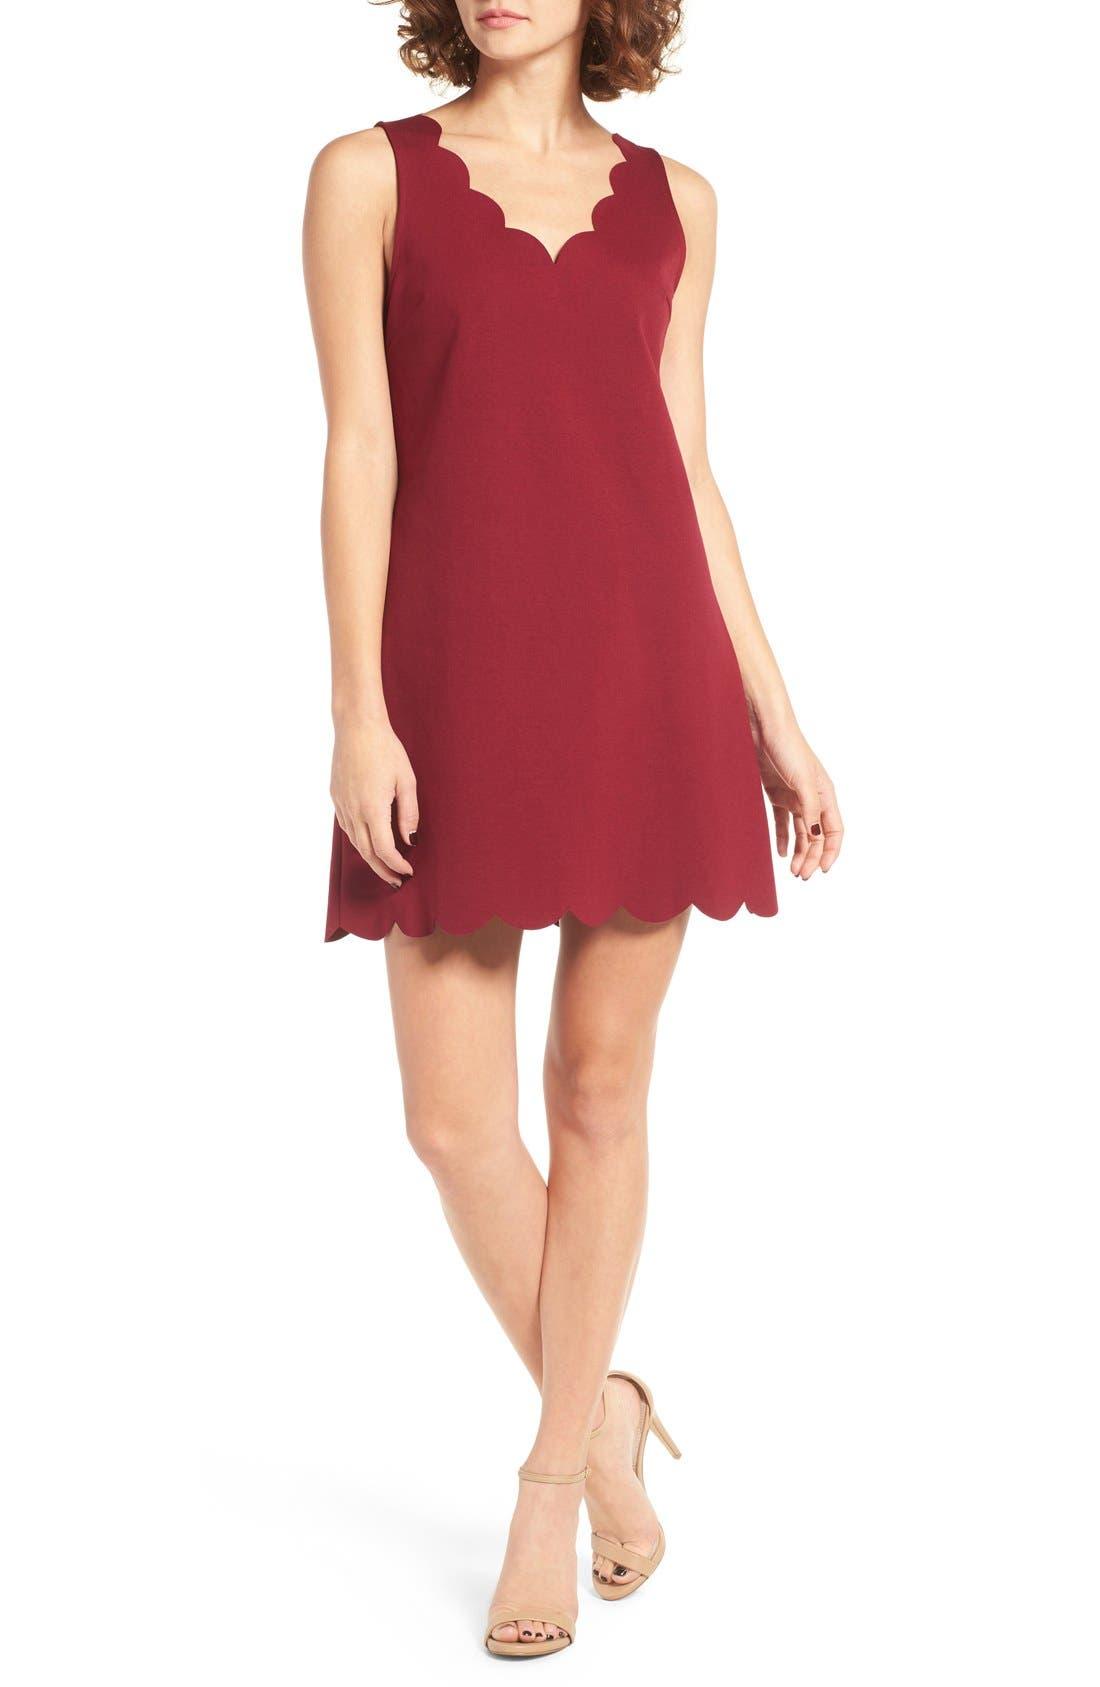 Alternate Image 1 Selected - Soprano Scalloped V-Neck A-Line Dress